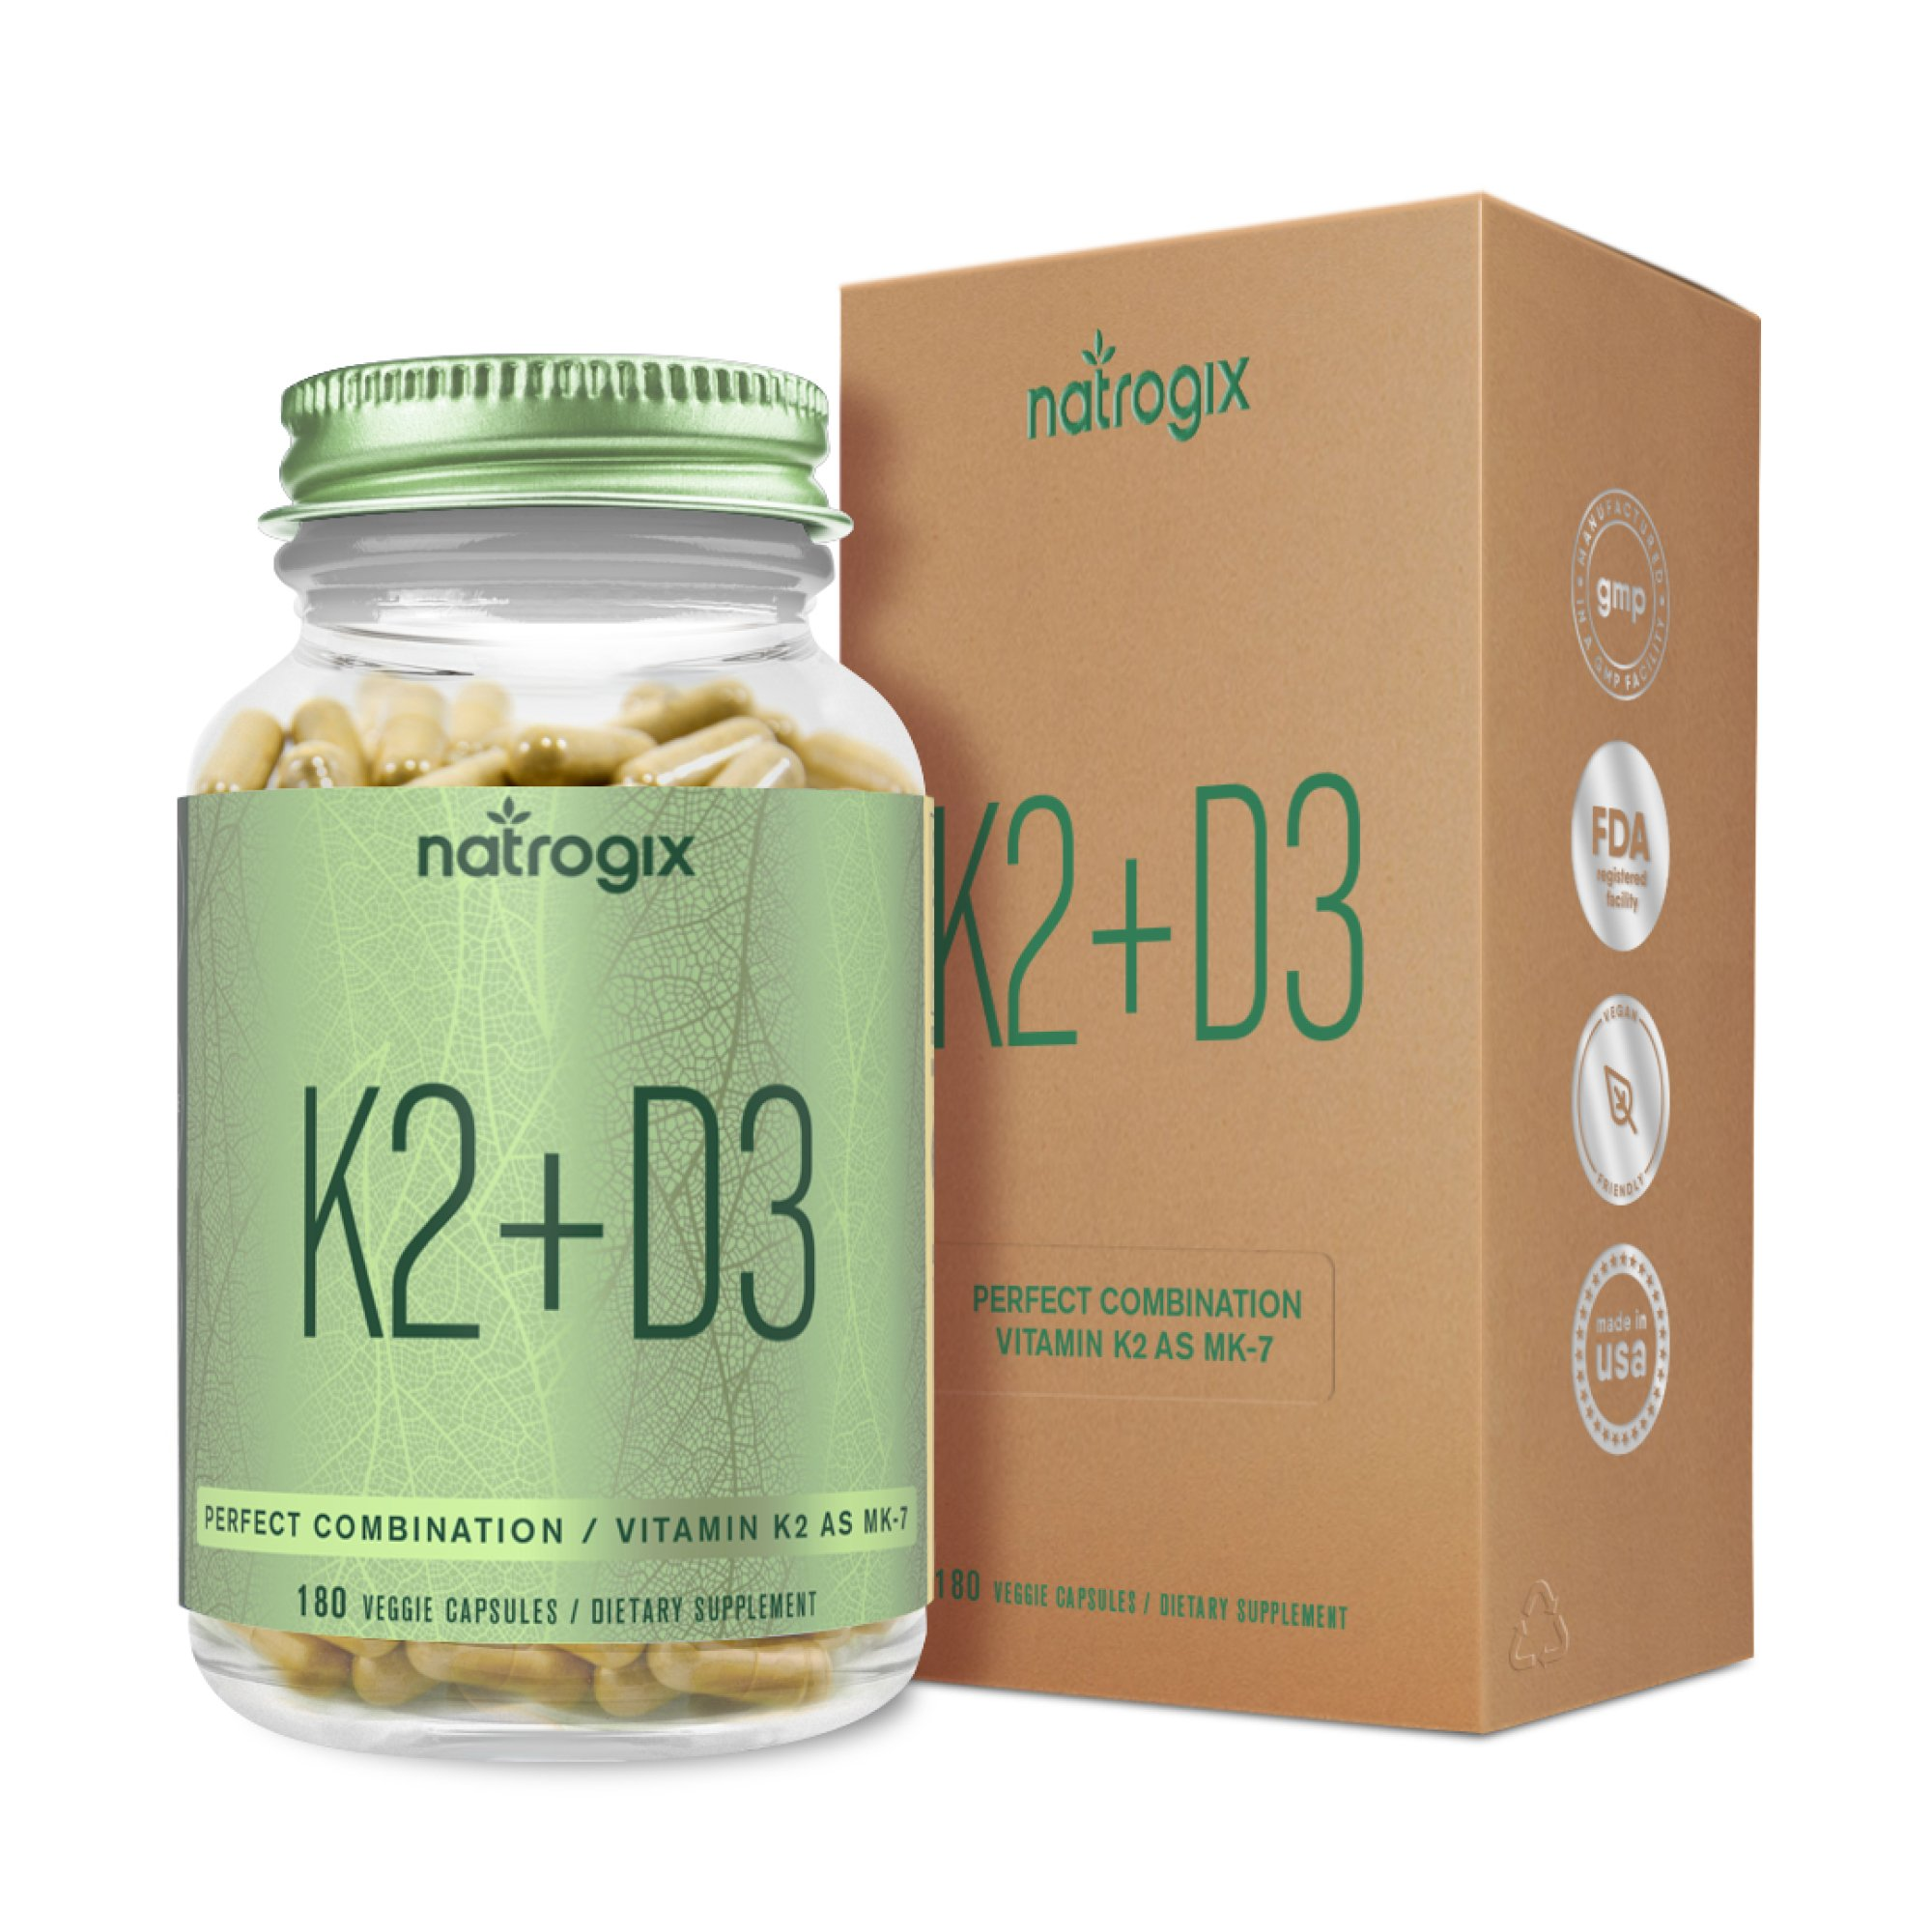 Natrogix Vitamin K2 (MK-7) with D3 Supplement - Maximum Strength Bone and Heart Health Formula - 5000 IU Vitamin D3 & 120 mcg Vitamin K2 MK7-180 Vegetable Capsules